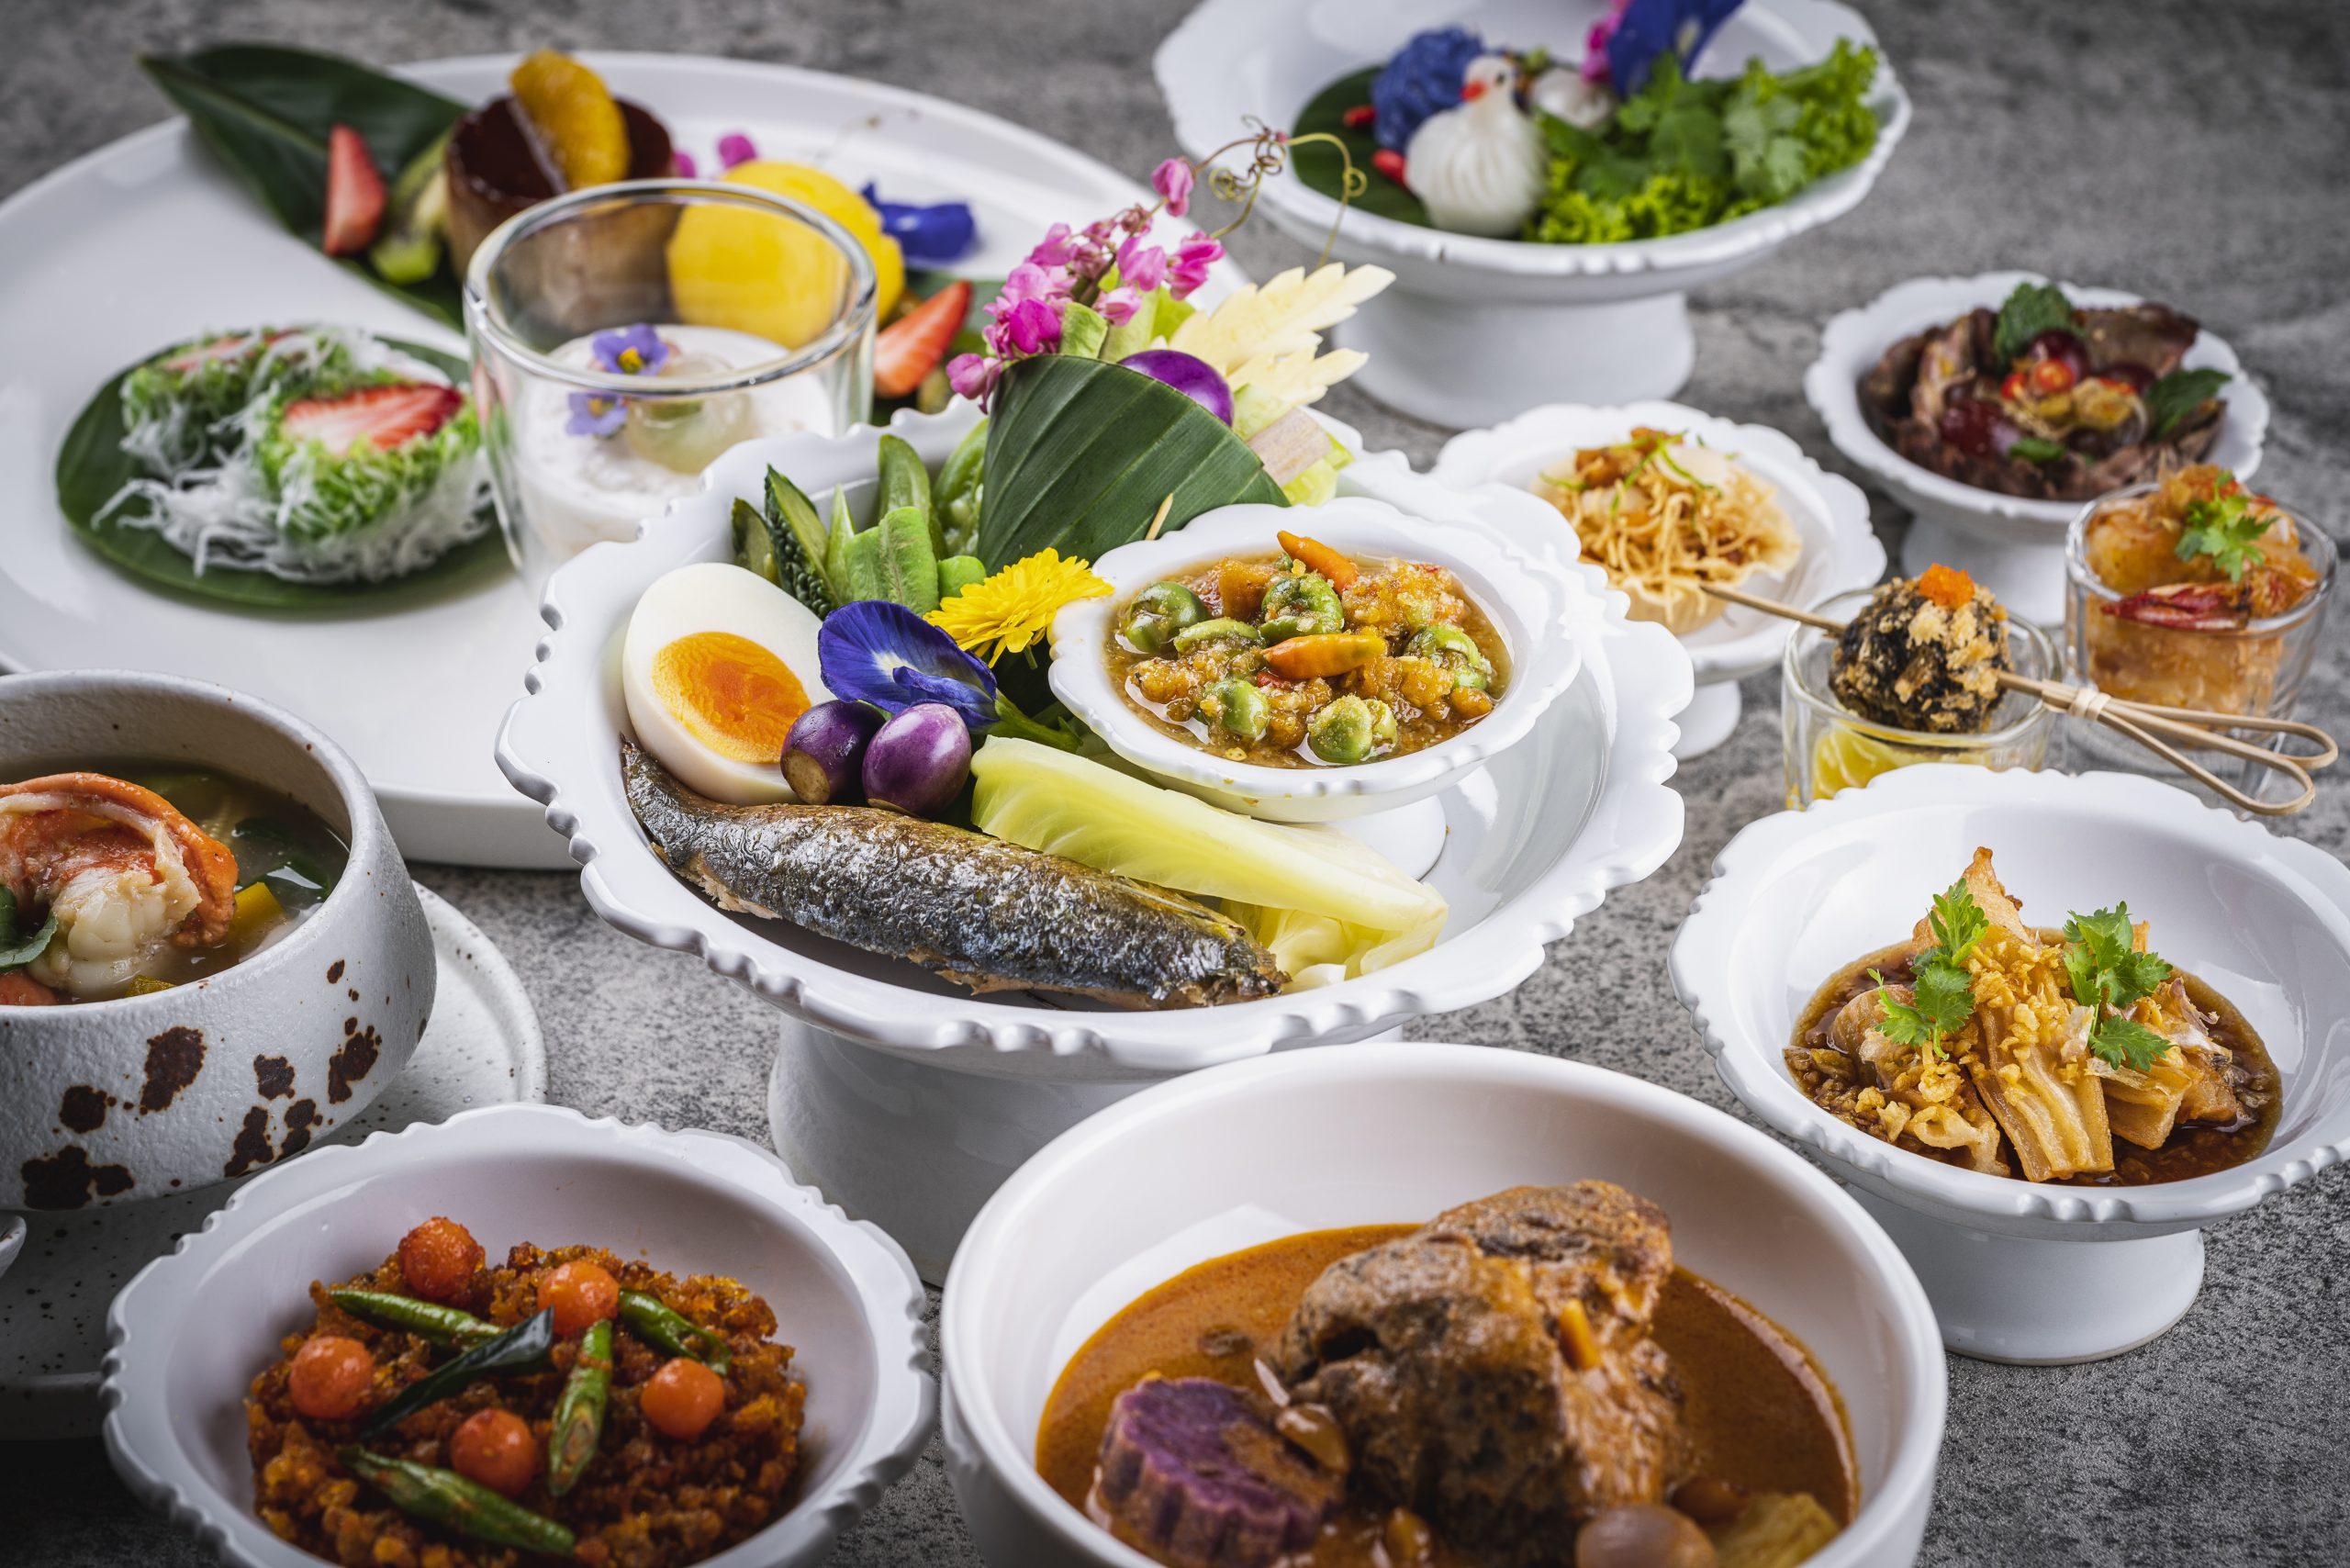 khao ข่าว มิชลินสตาร์ ร้านอาหารไทย